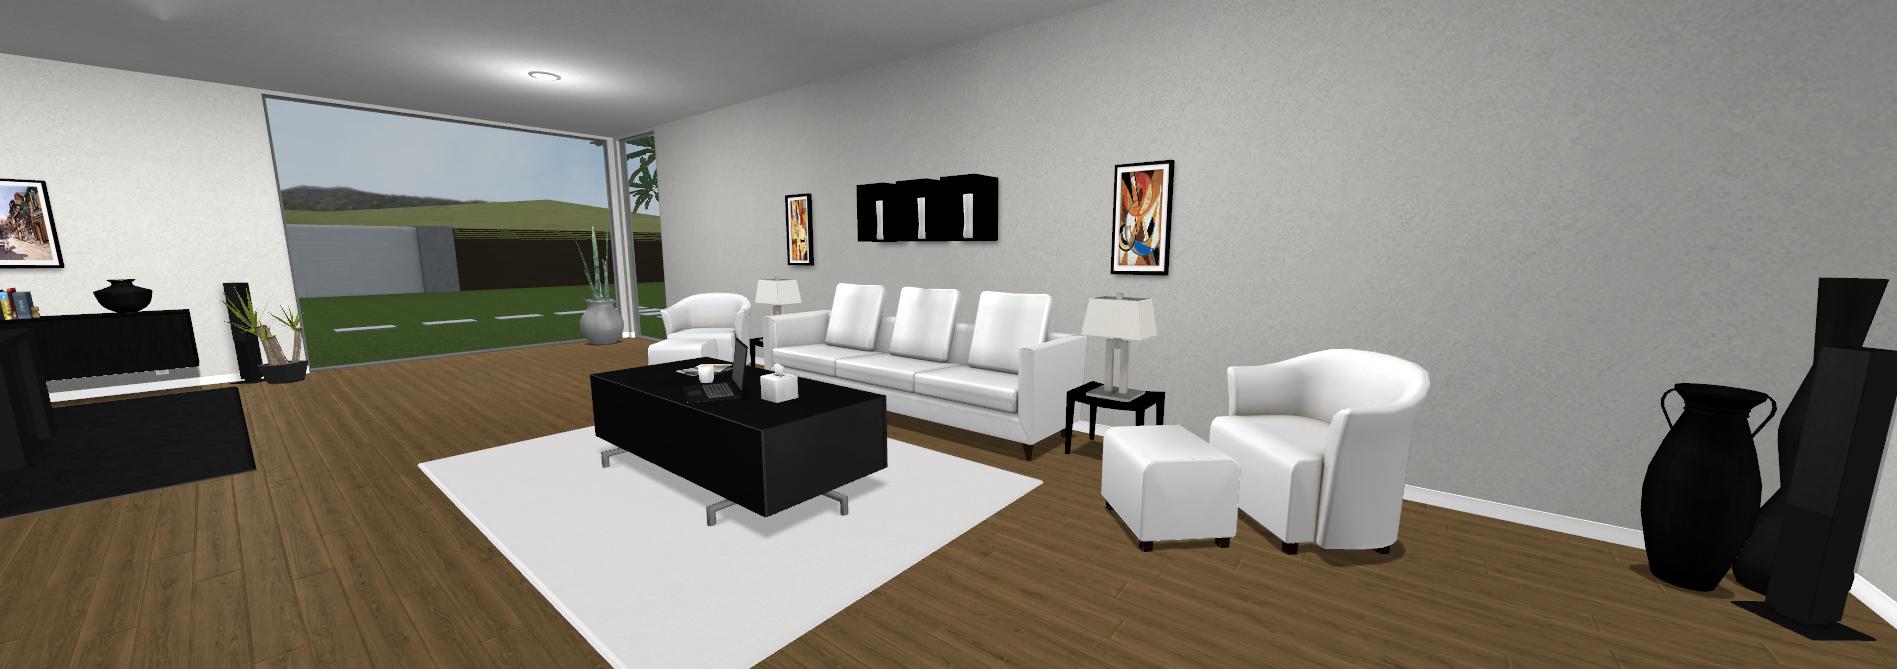 Contemporary Villa - Office